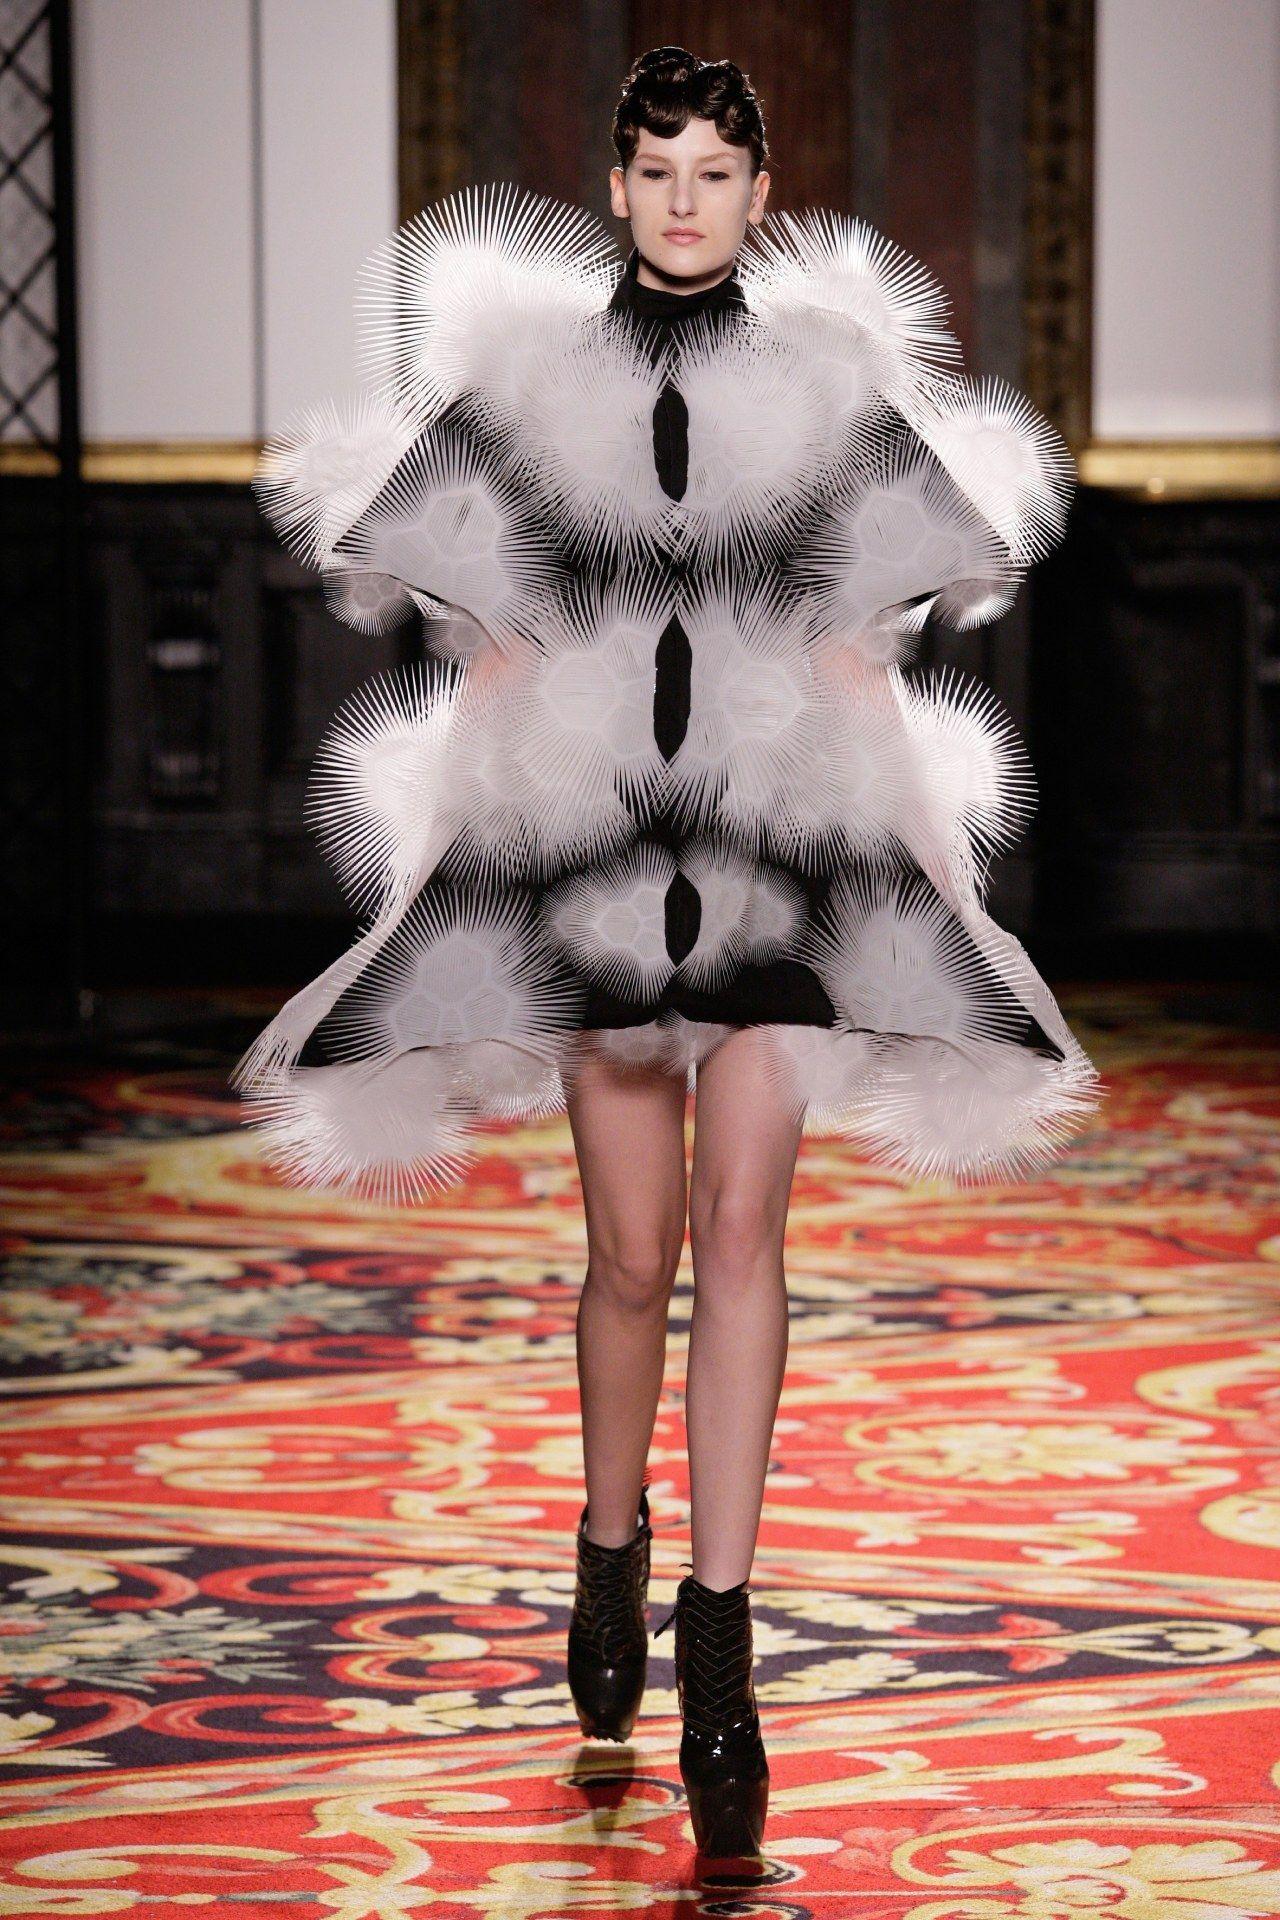 Iris van Herpen Spring13 Couture - #2013 #catwalk #couture #fashion #herpen #high #iris #rtw #runway #style #van